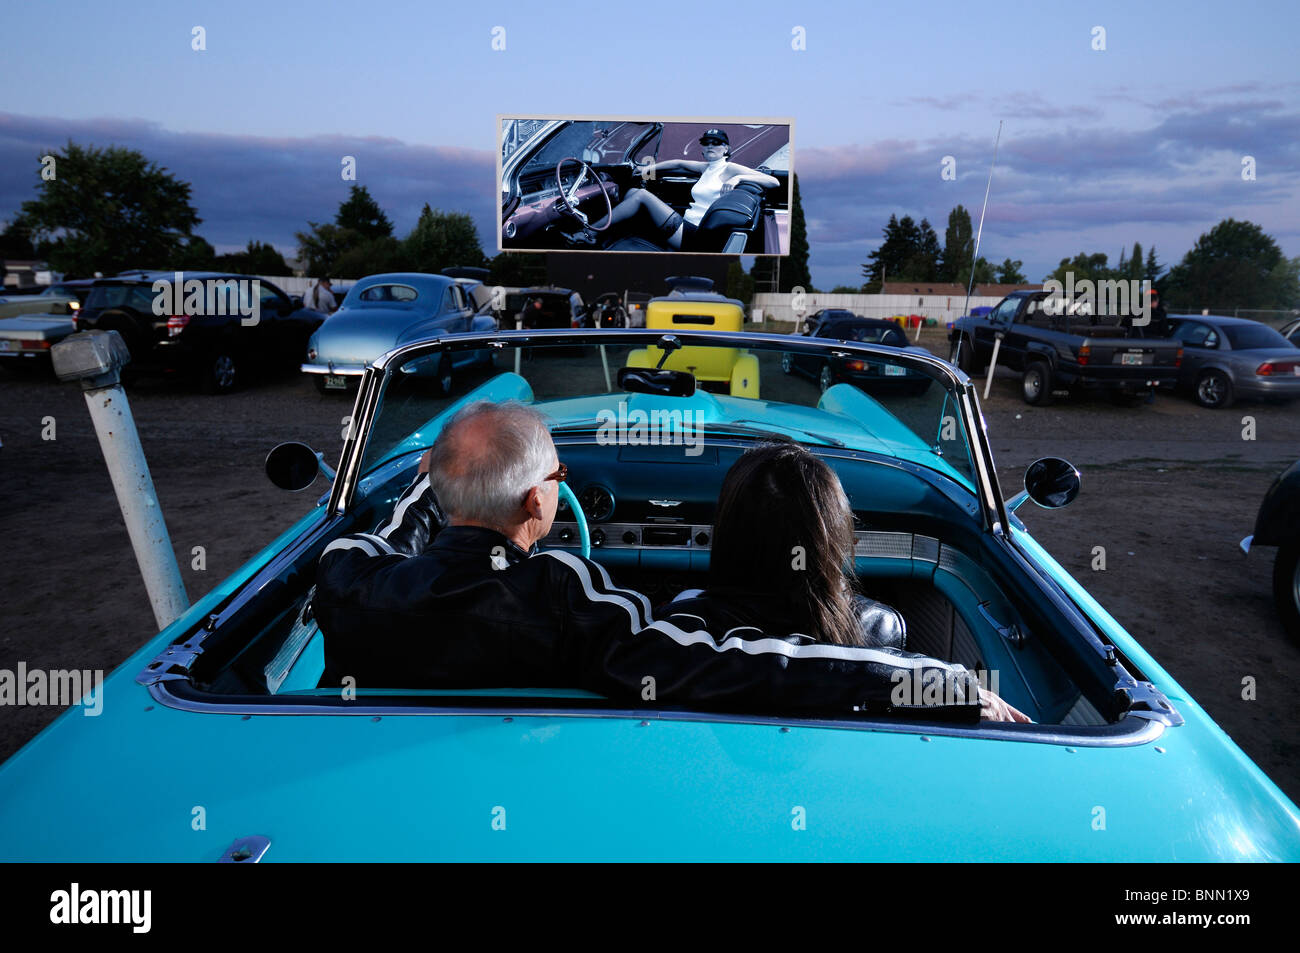 Mann Frau paar Oldtimer 1955 T-Bird Motor Vu fahren In Dallas Oregon USA Kino parken, Stockbild